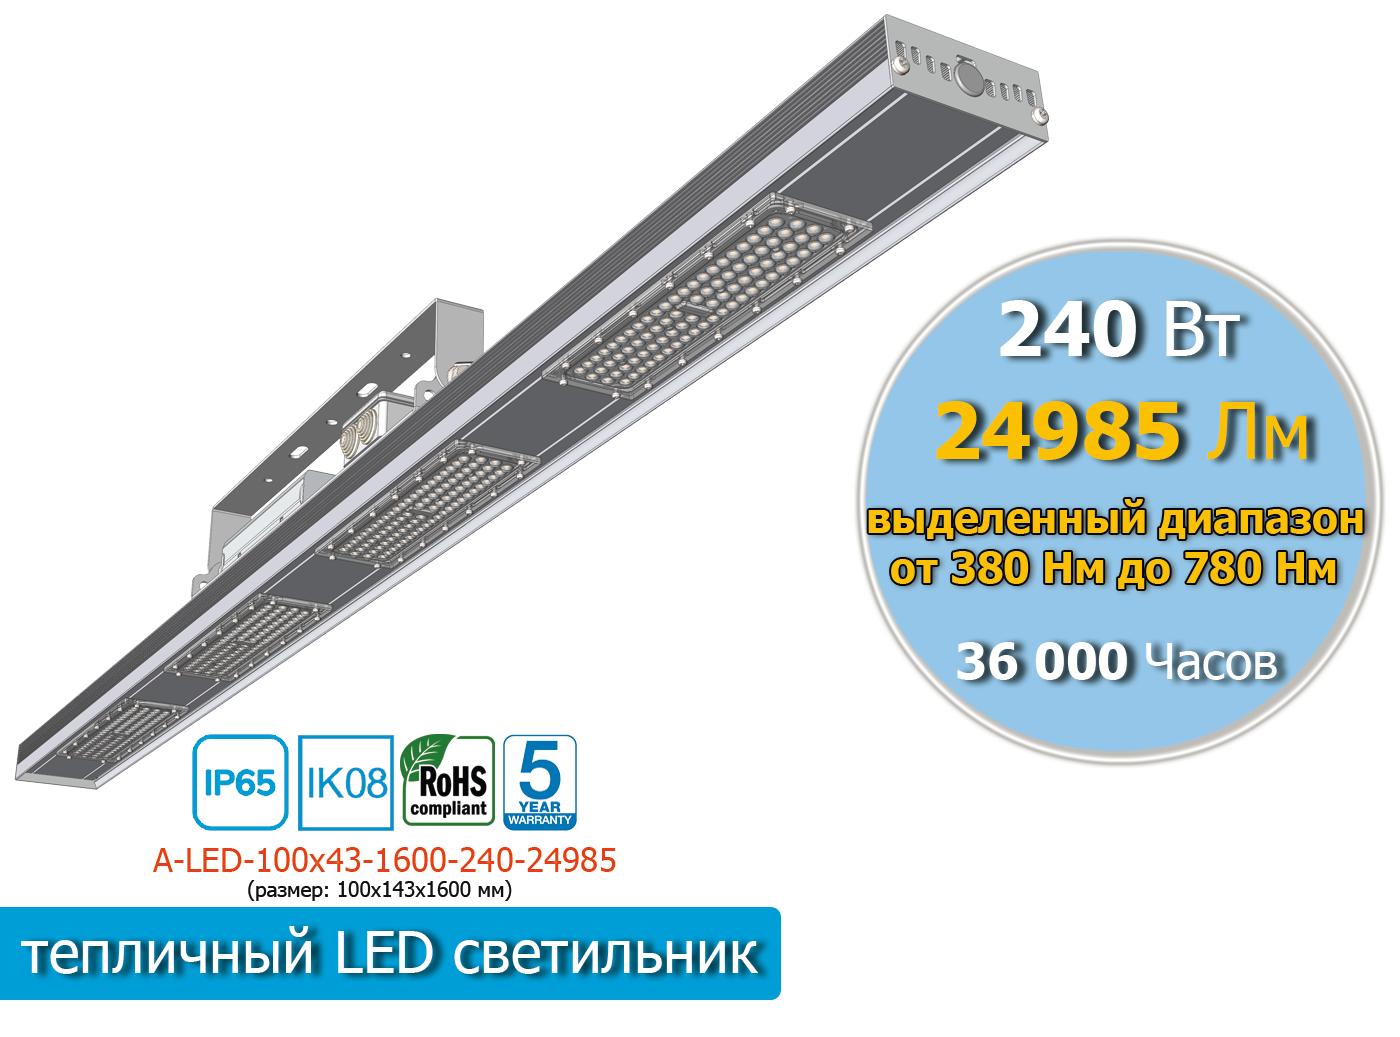 A-LED-100х43-1-1600-240-24985